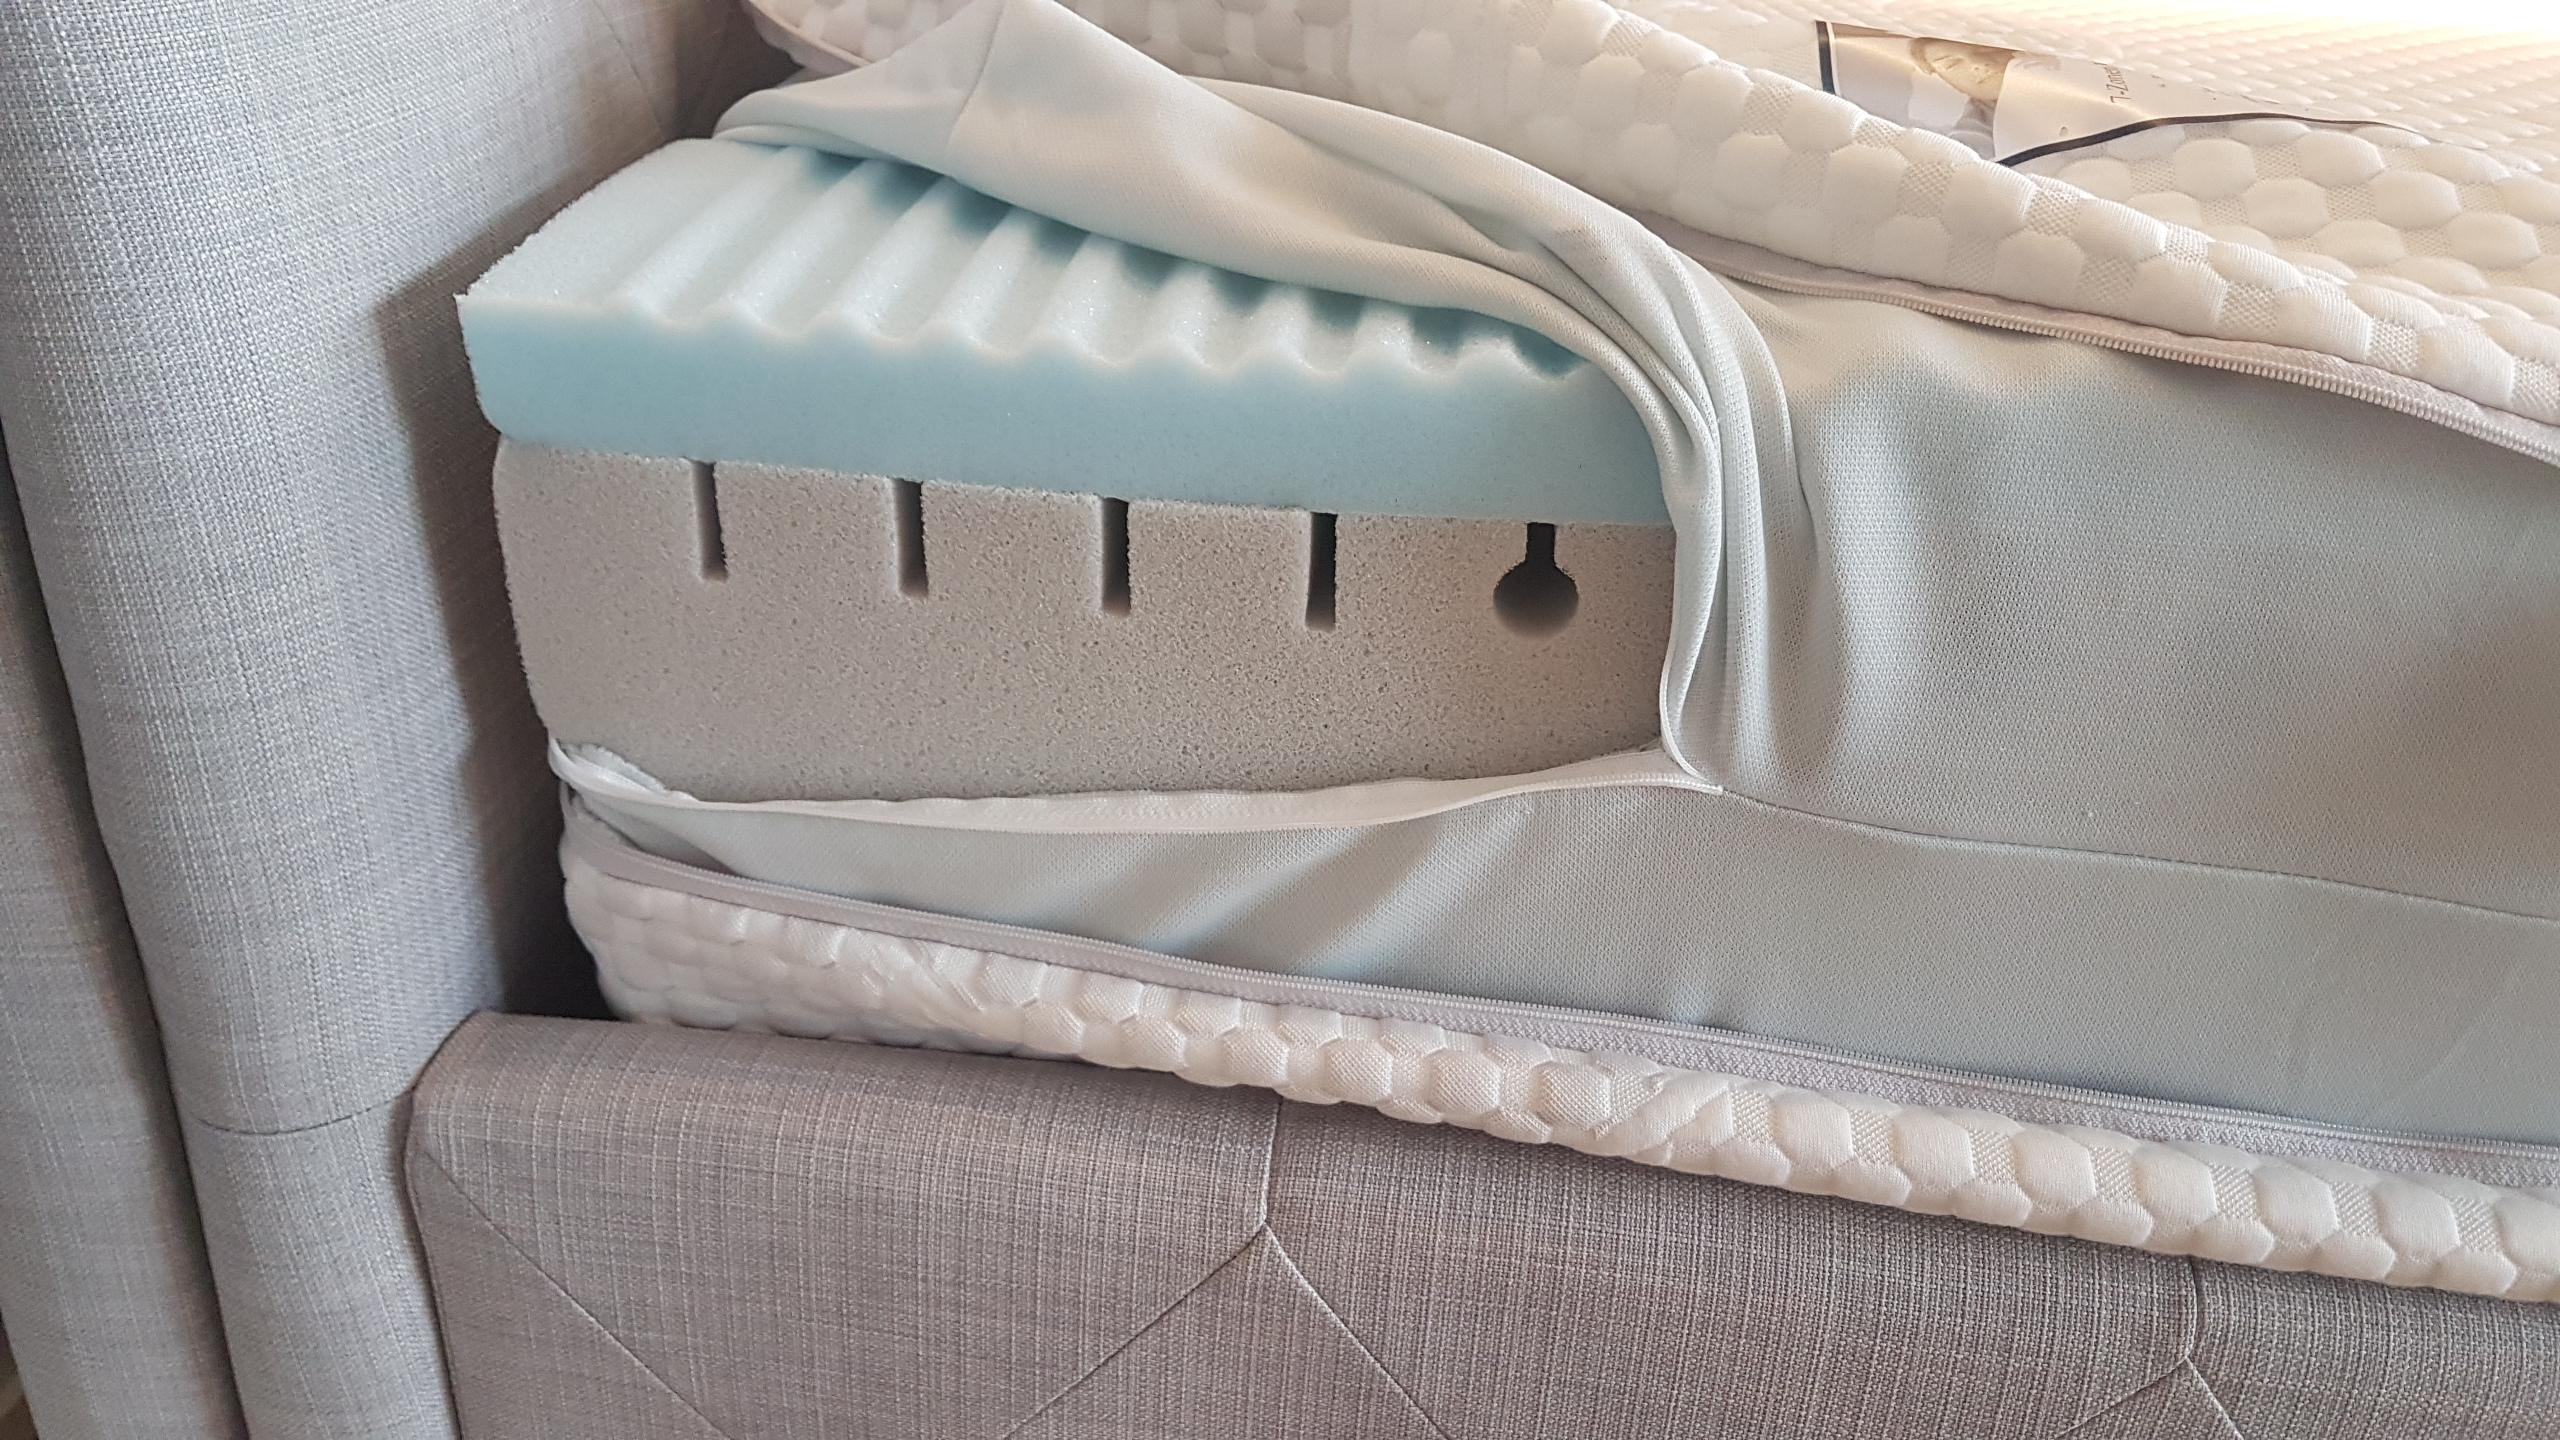 kopfkissen testsieger 2014 kopfkissen federn daunen test standardma bettw sche kommode wei. Black Bedroom Furniture Sets. Home Design Ideas